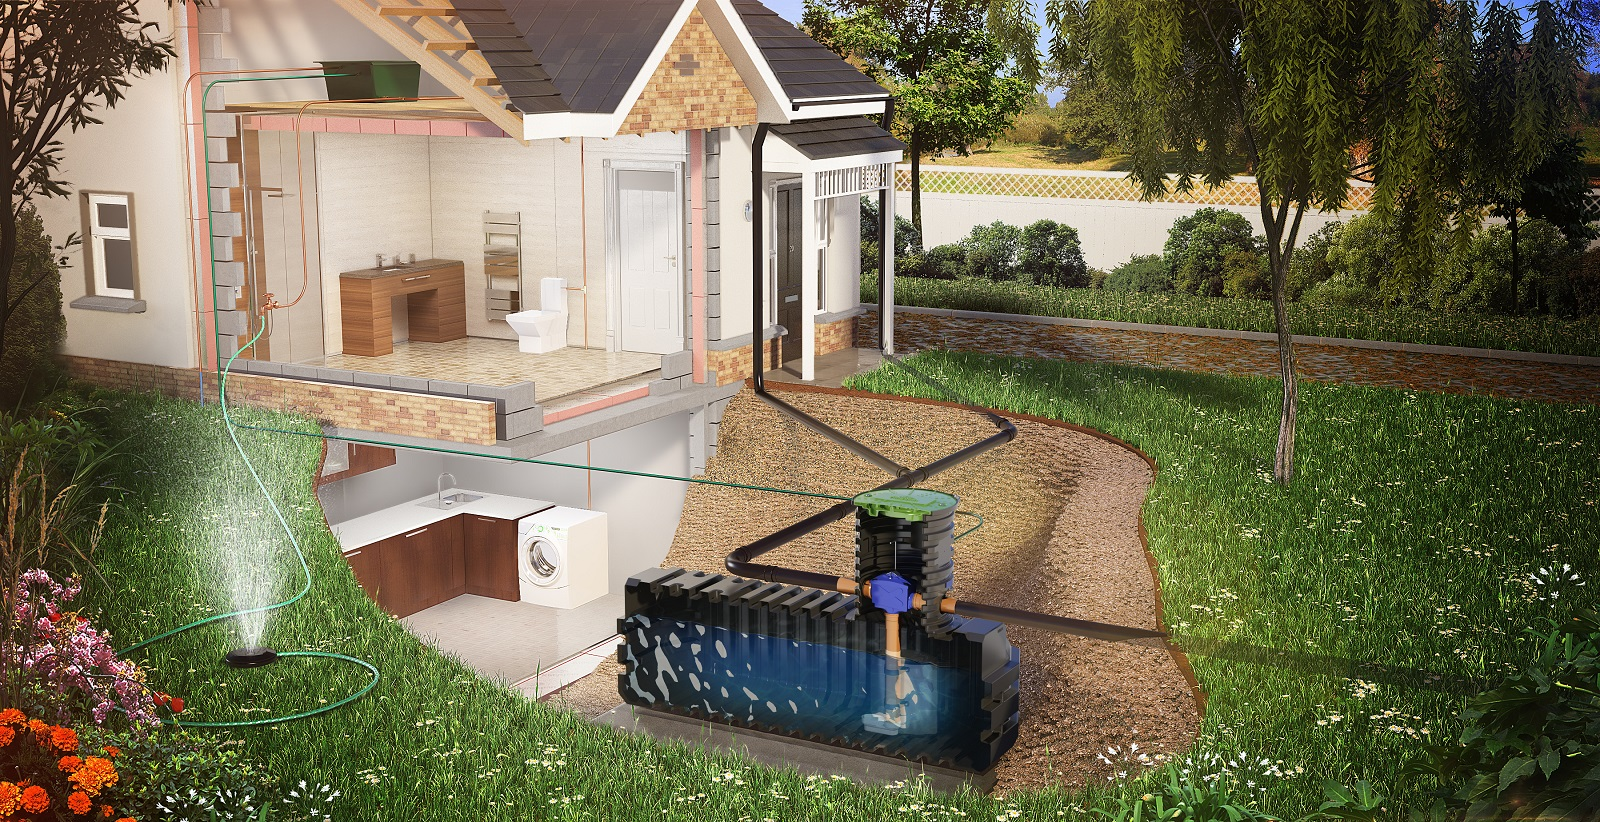 Domestic rainwater management system